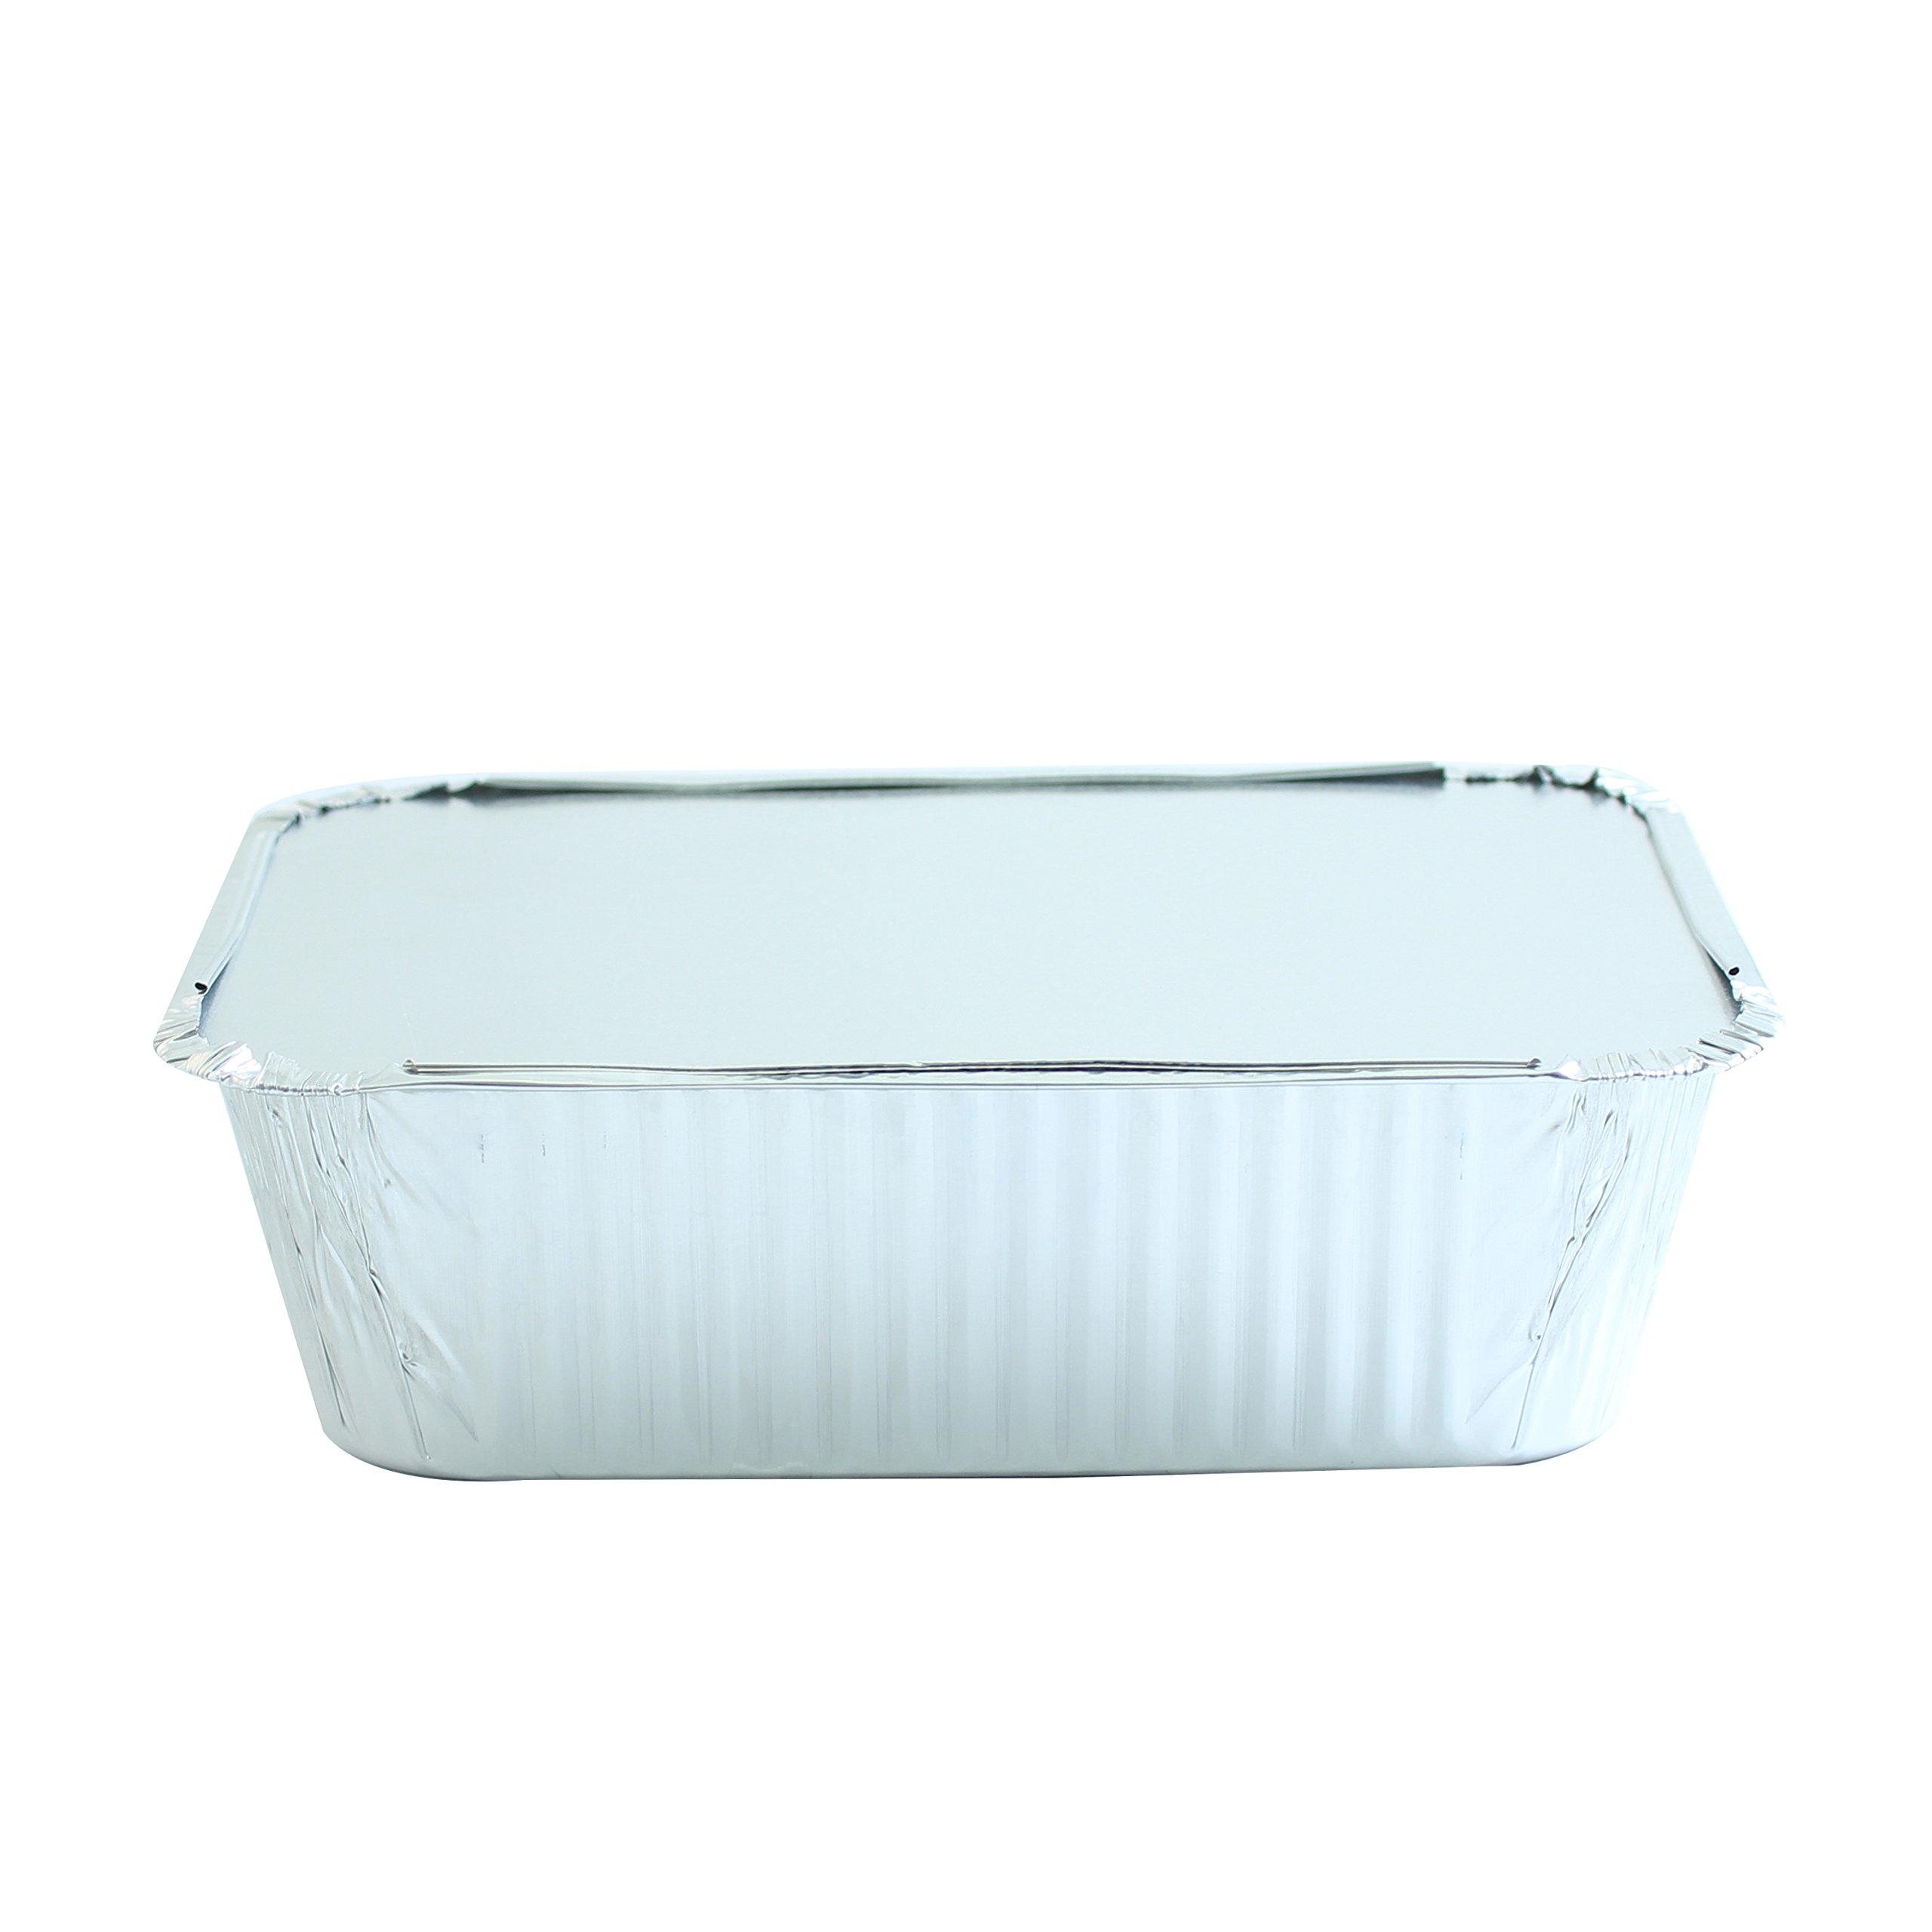 Party Bargains Premium Quality Durable, 9 X 7 Aluminum Foil Pans 5 Lb Capacity with Board Lids (50 Count) by Party Bargains (Image #5)